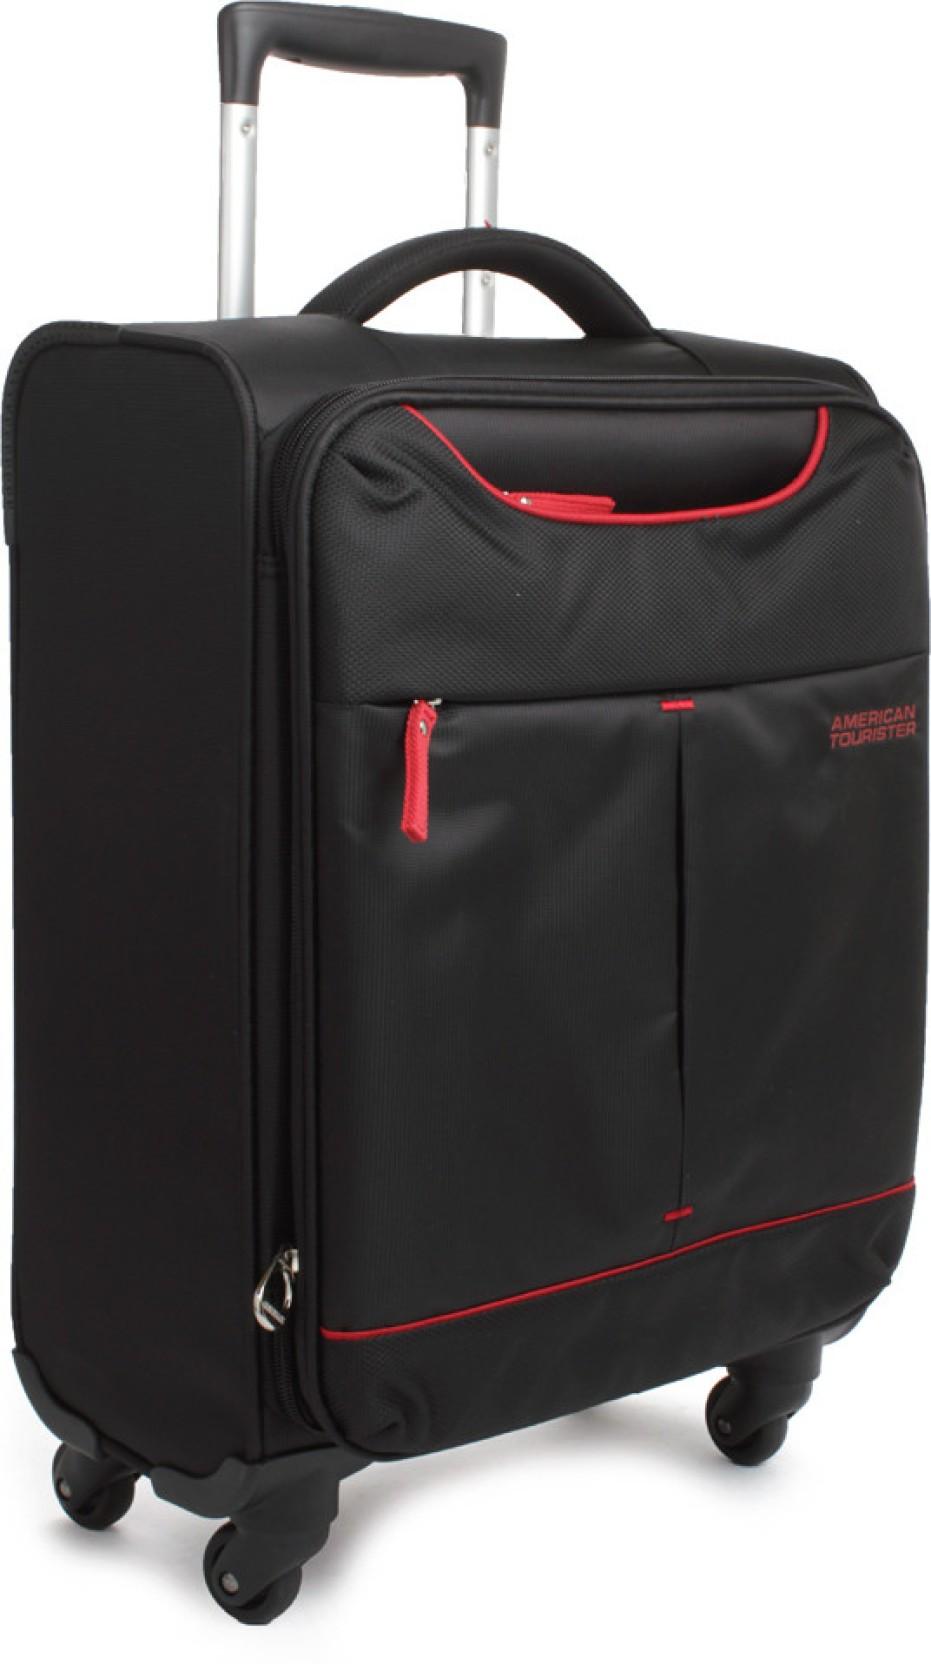 Light Weight American Tourister Bag For International Travel